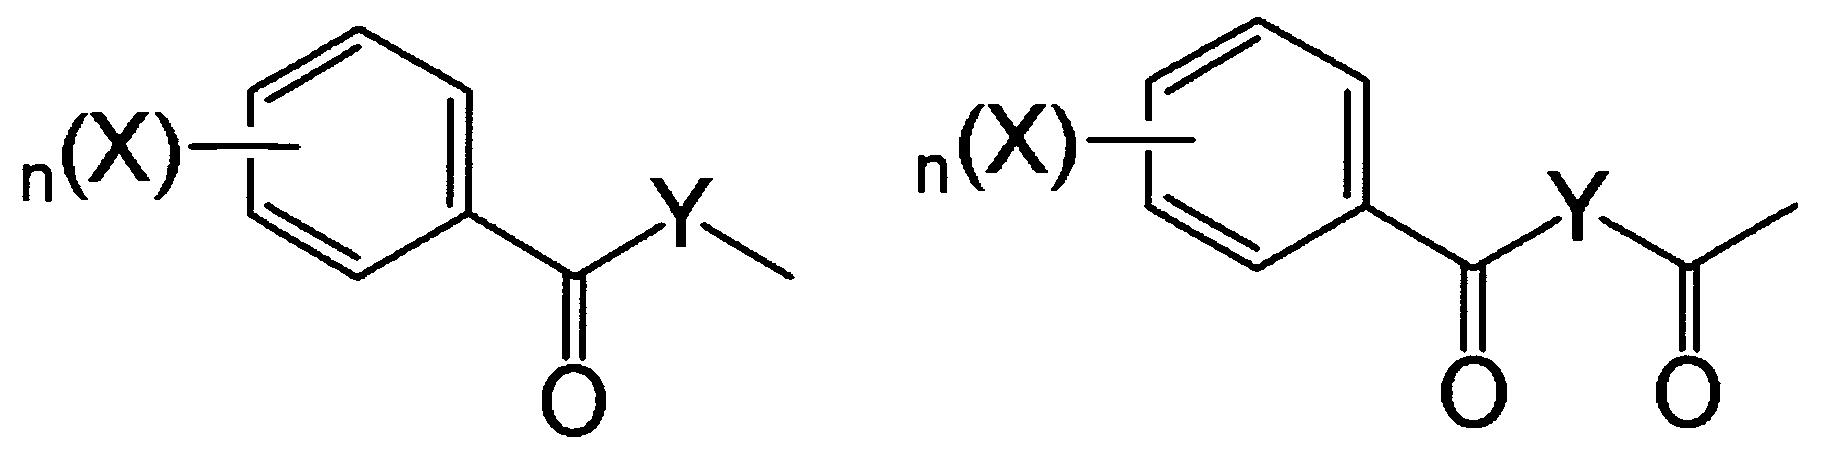 Figure 112012046241217-pct00017